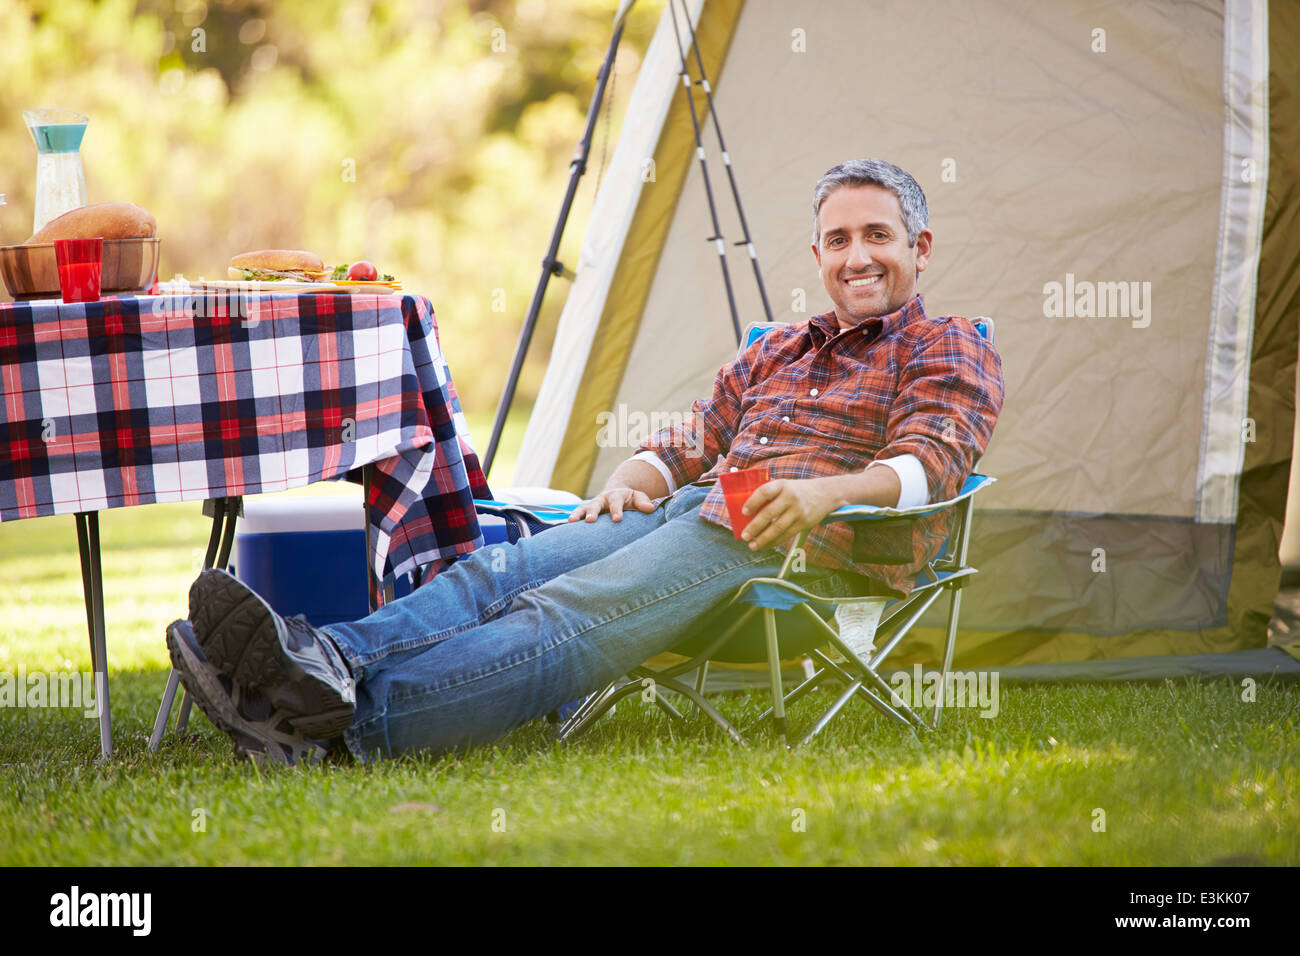 Man Enjoying Camping Holiday In Countryside - Stock Image